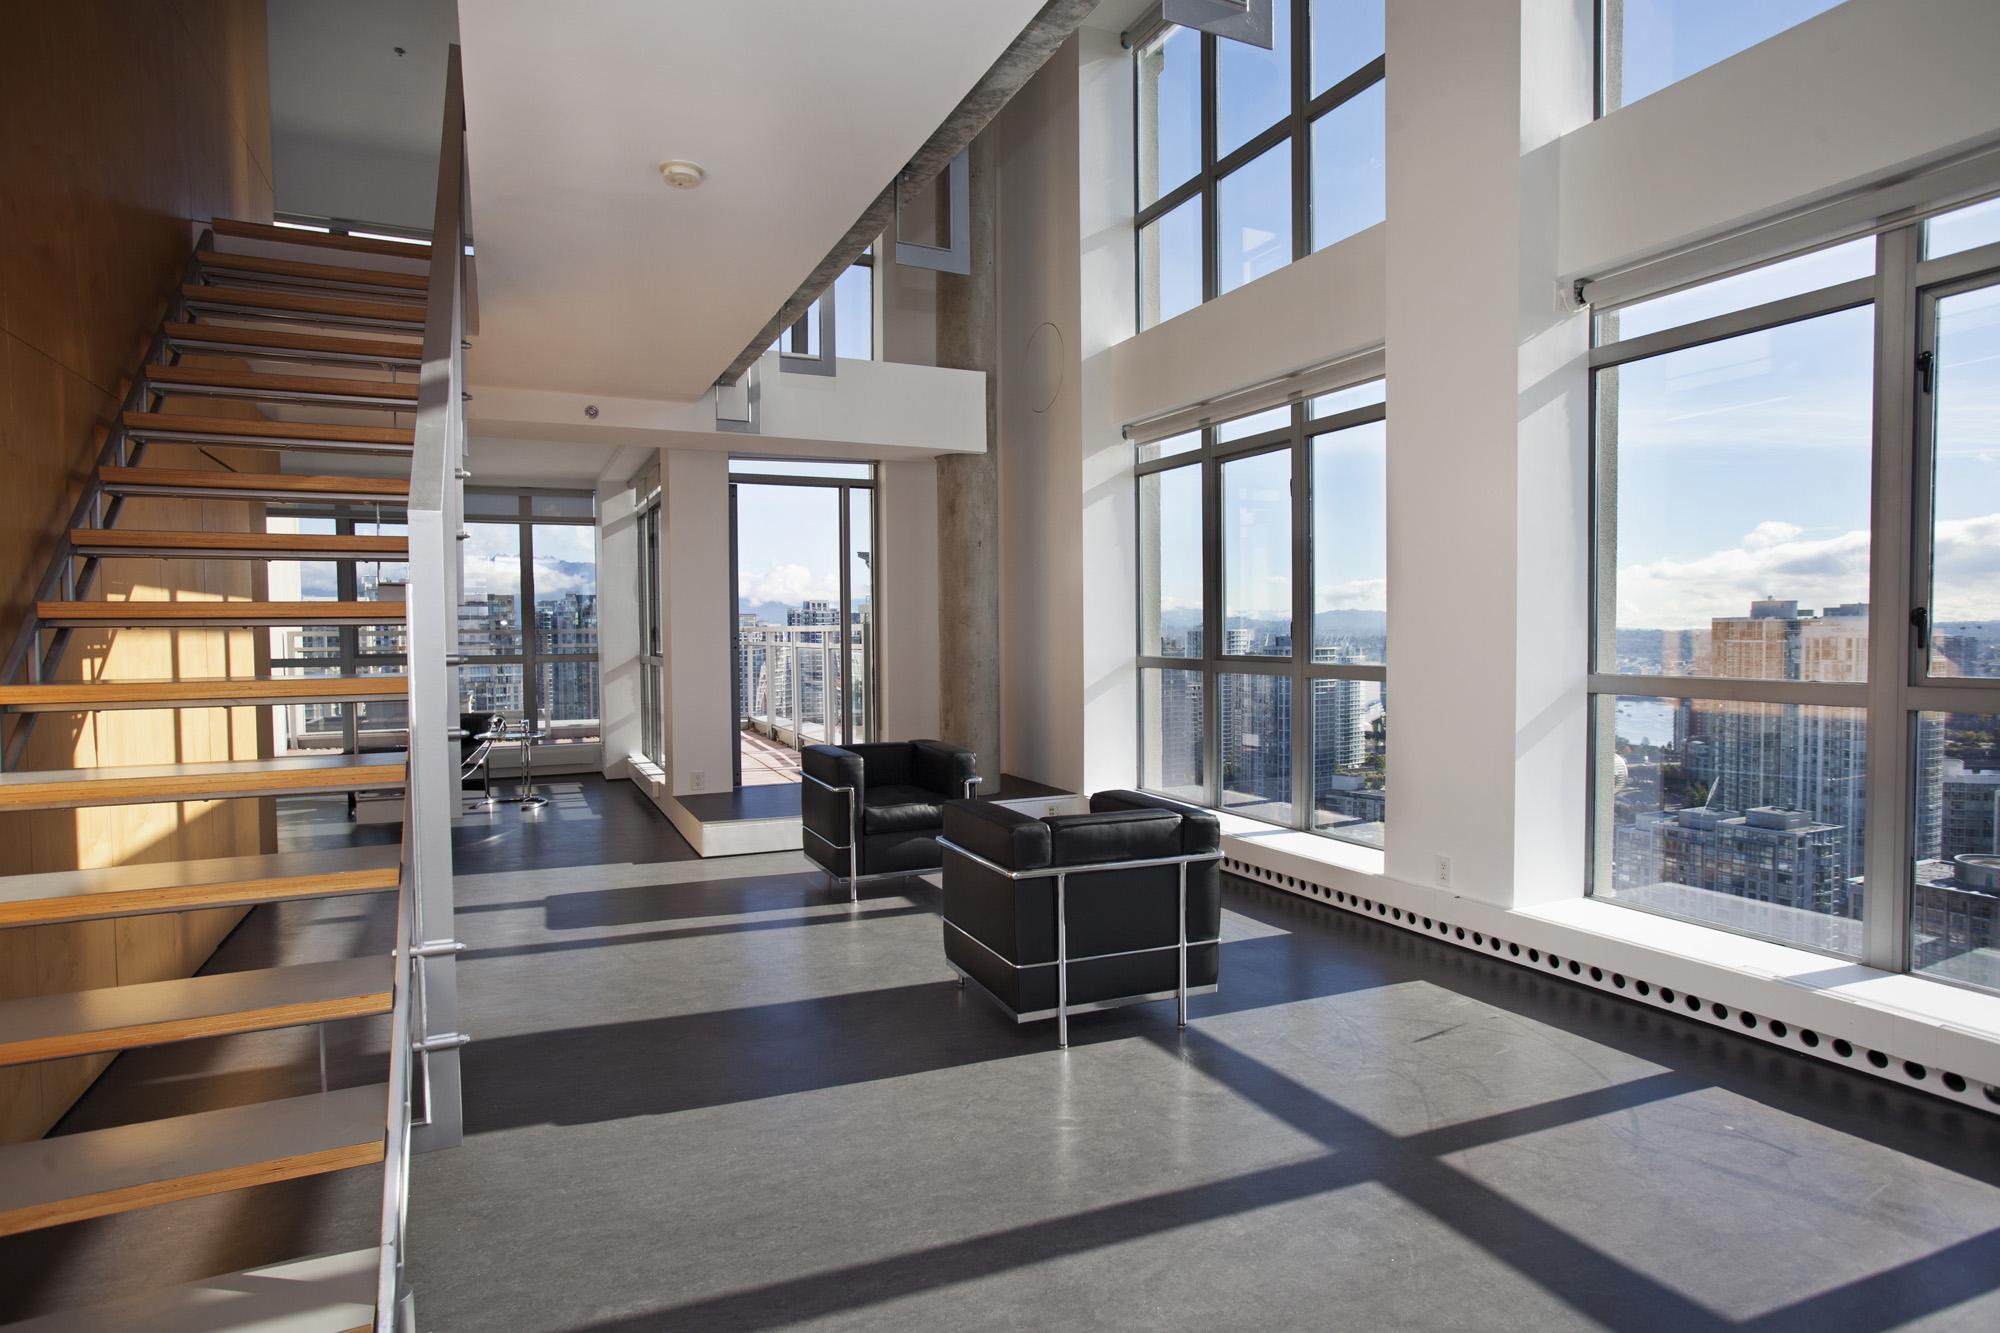 Blog Yaletown Vancouver Lofts For Sale Albrighton Real Estate Vancouver Lofts Modern